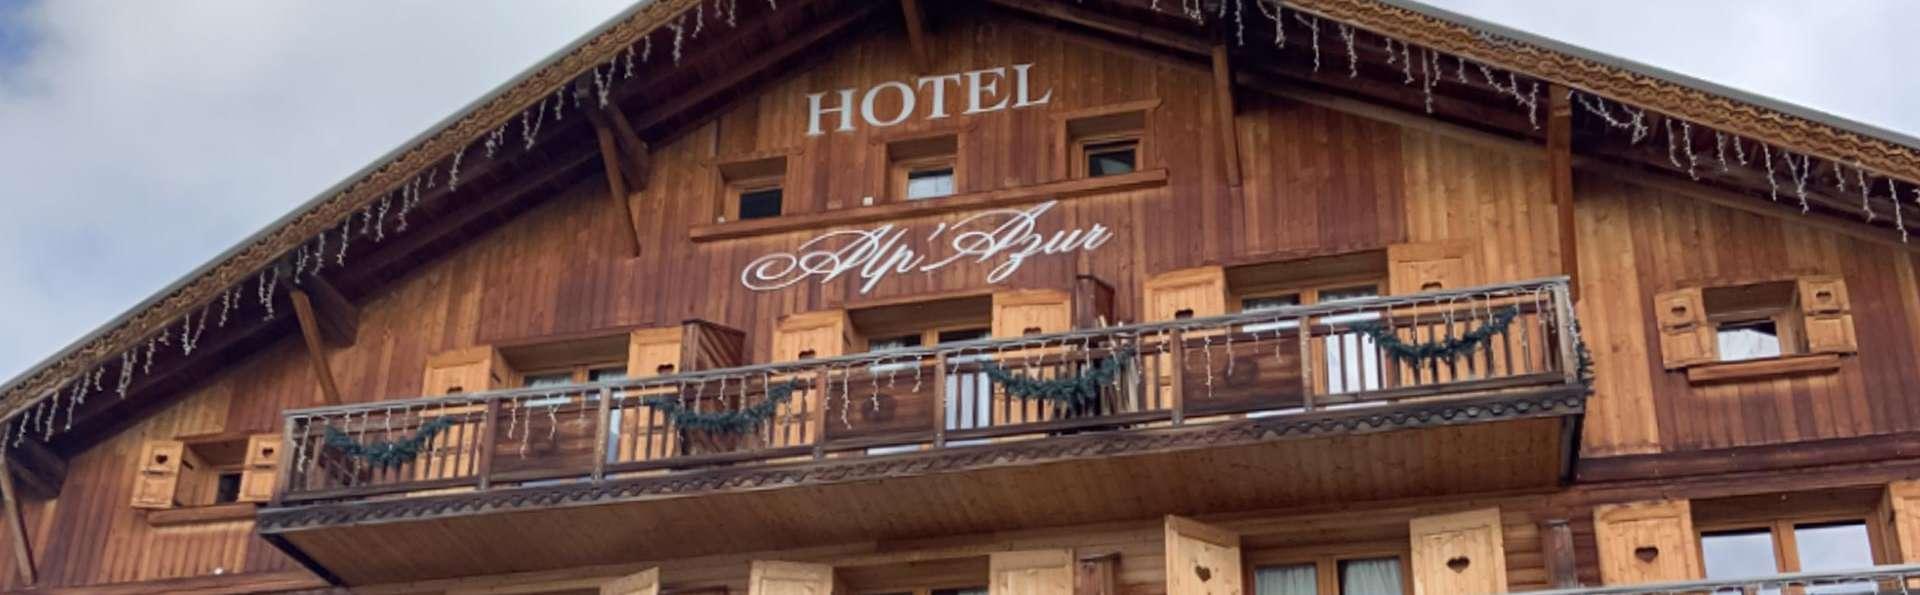 Hôtel Alp'azur - EDIT_FRONT_02.jpg